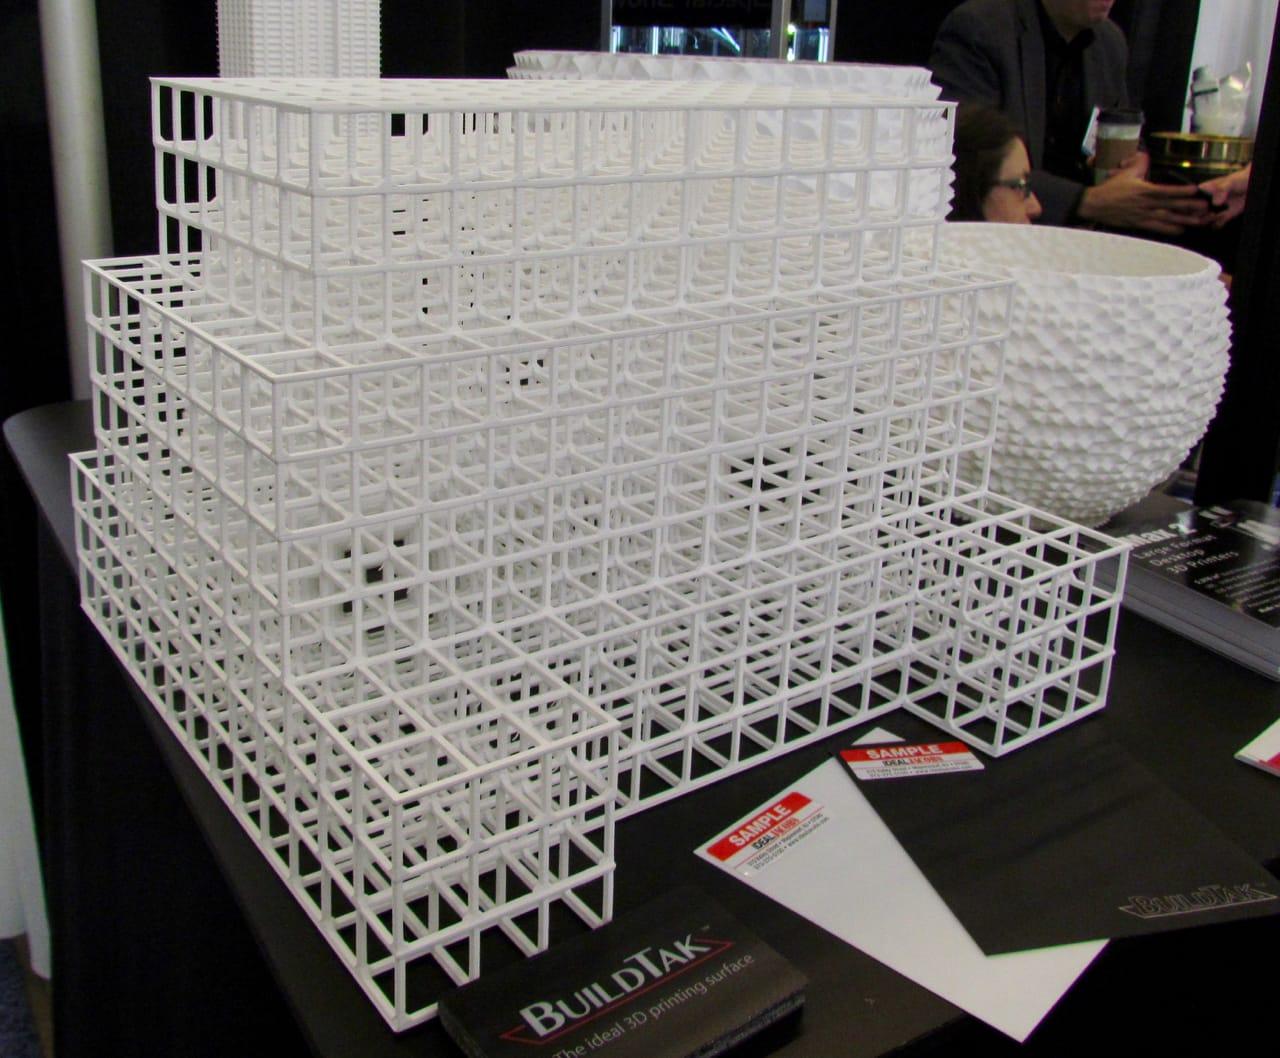 Design of the Week: The Ultimate Bridge Test